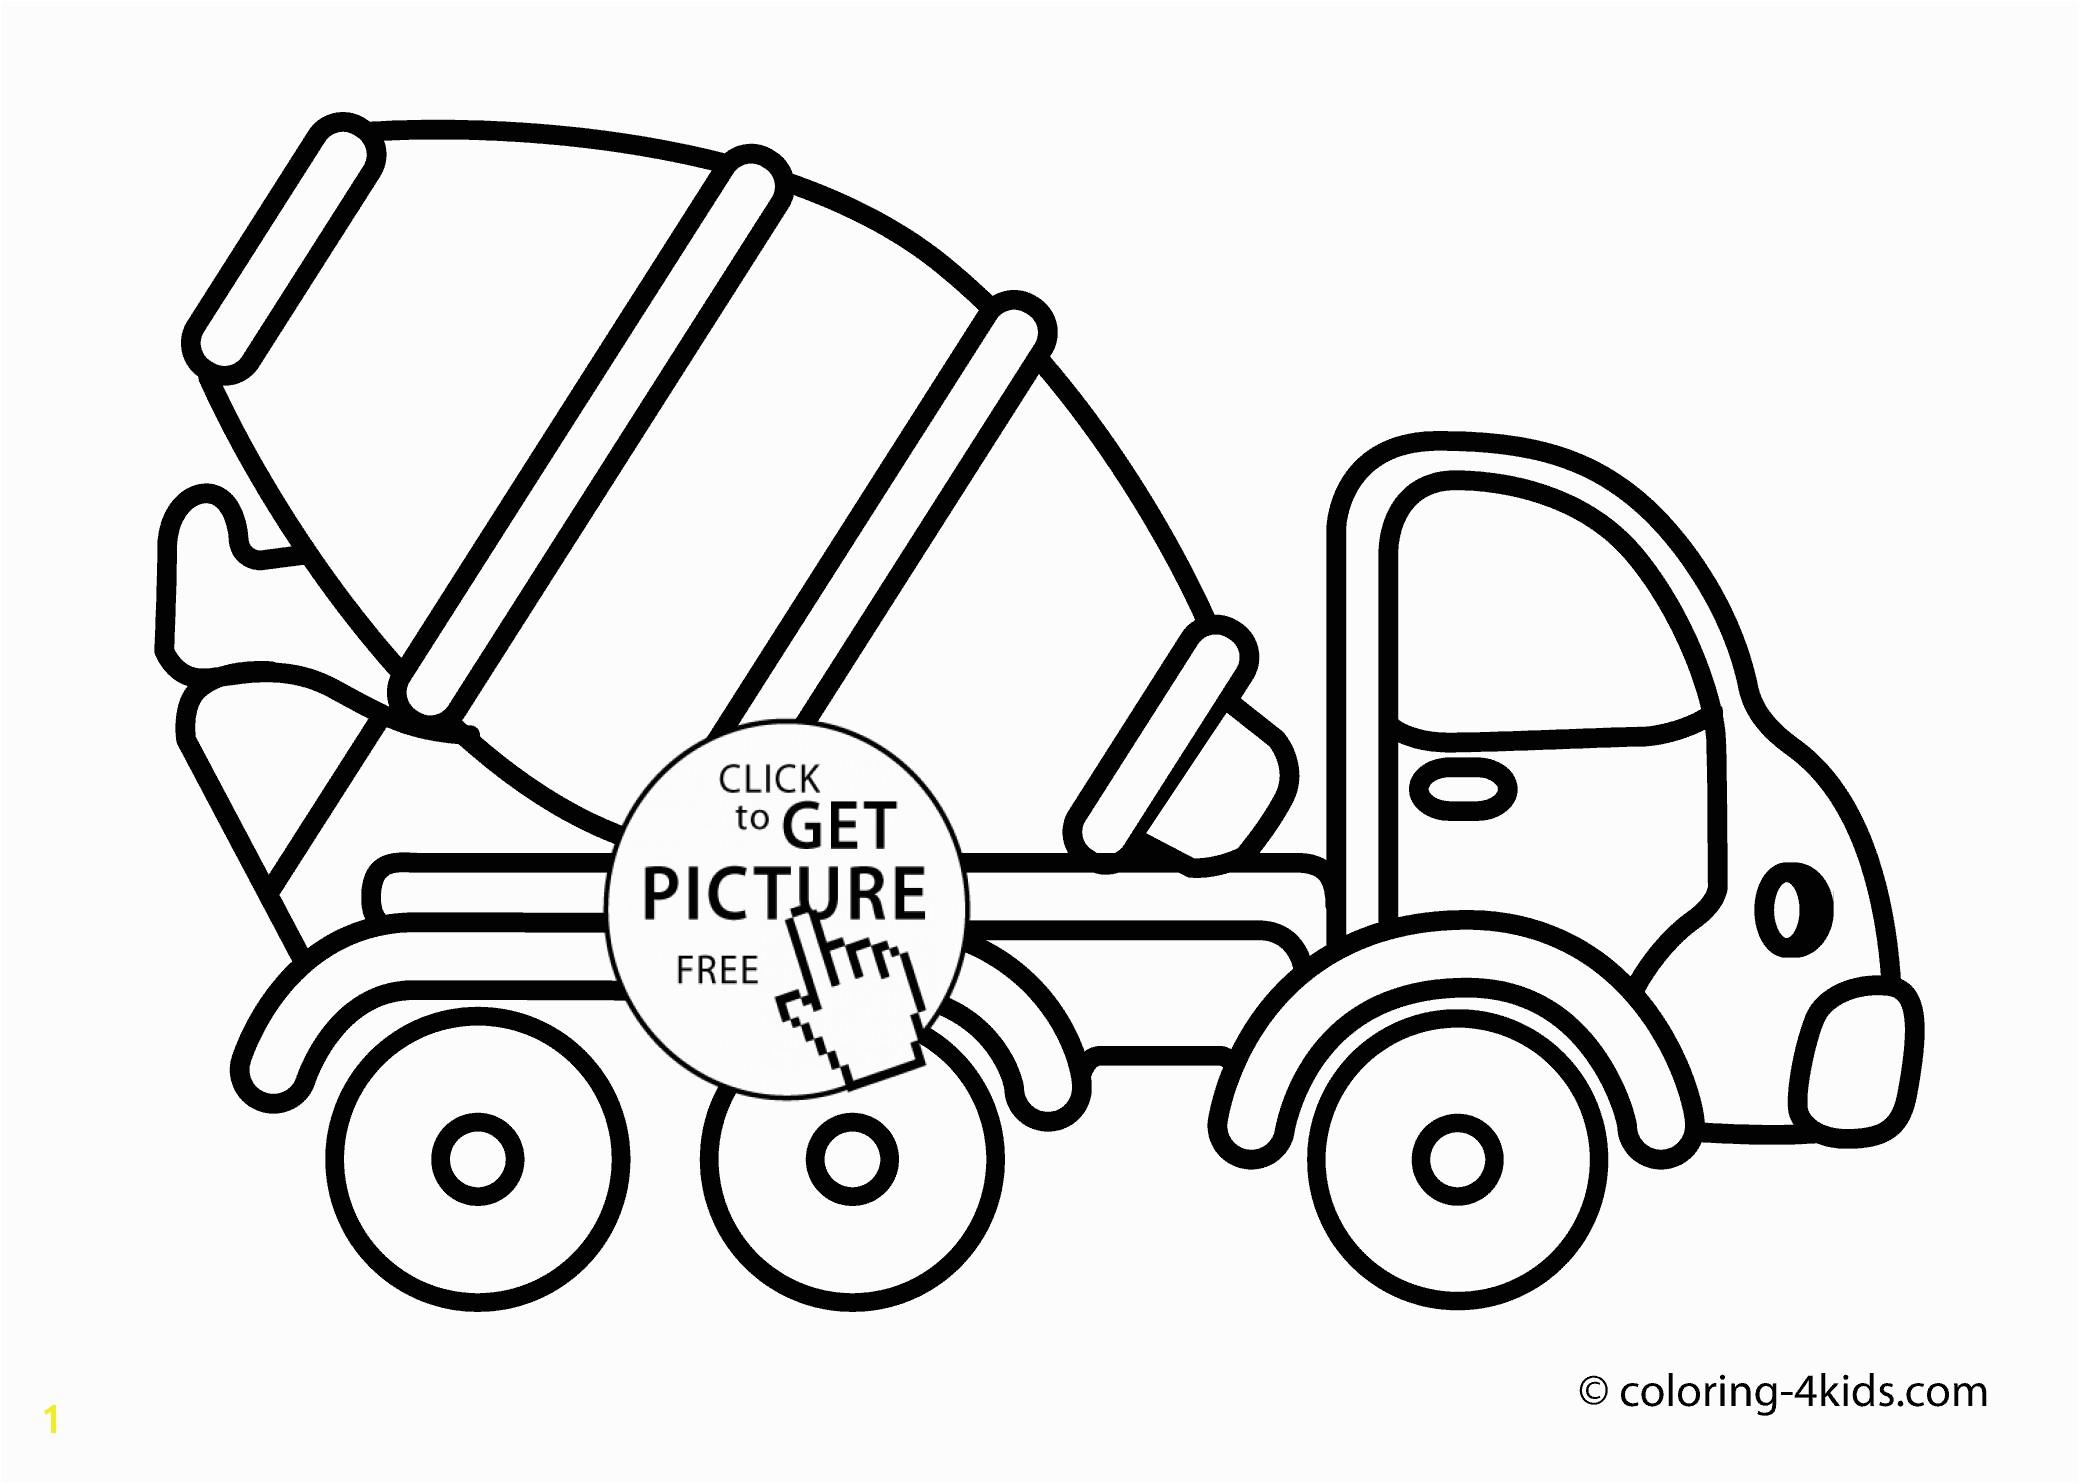 2079x1483 Cement mixer truck Transportation coloring pages concrete truck